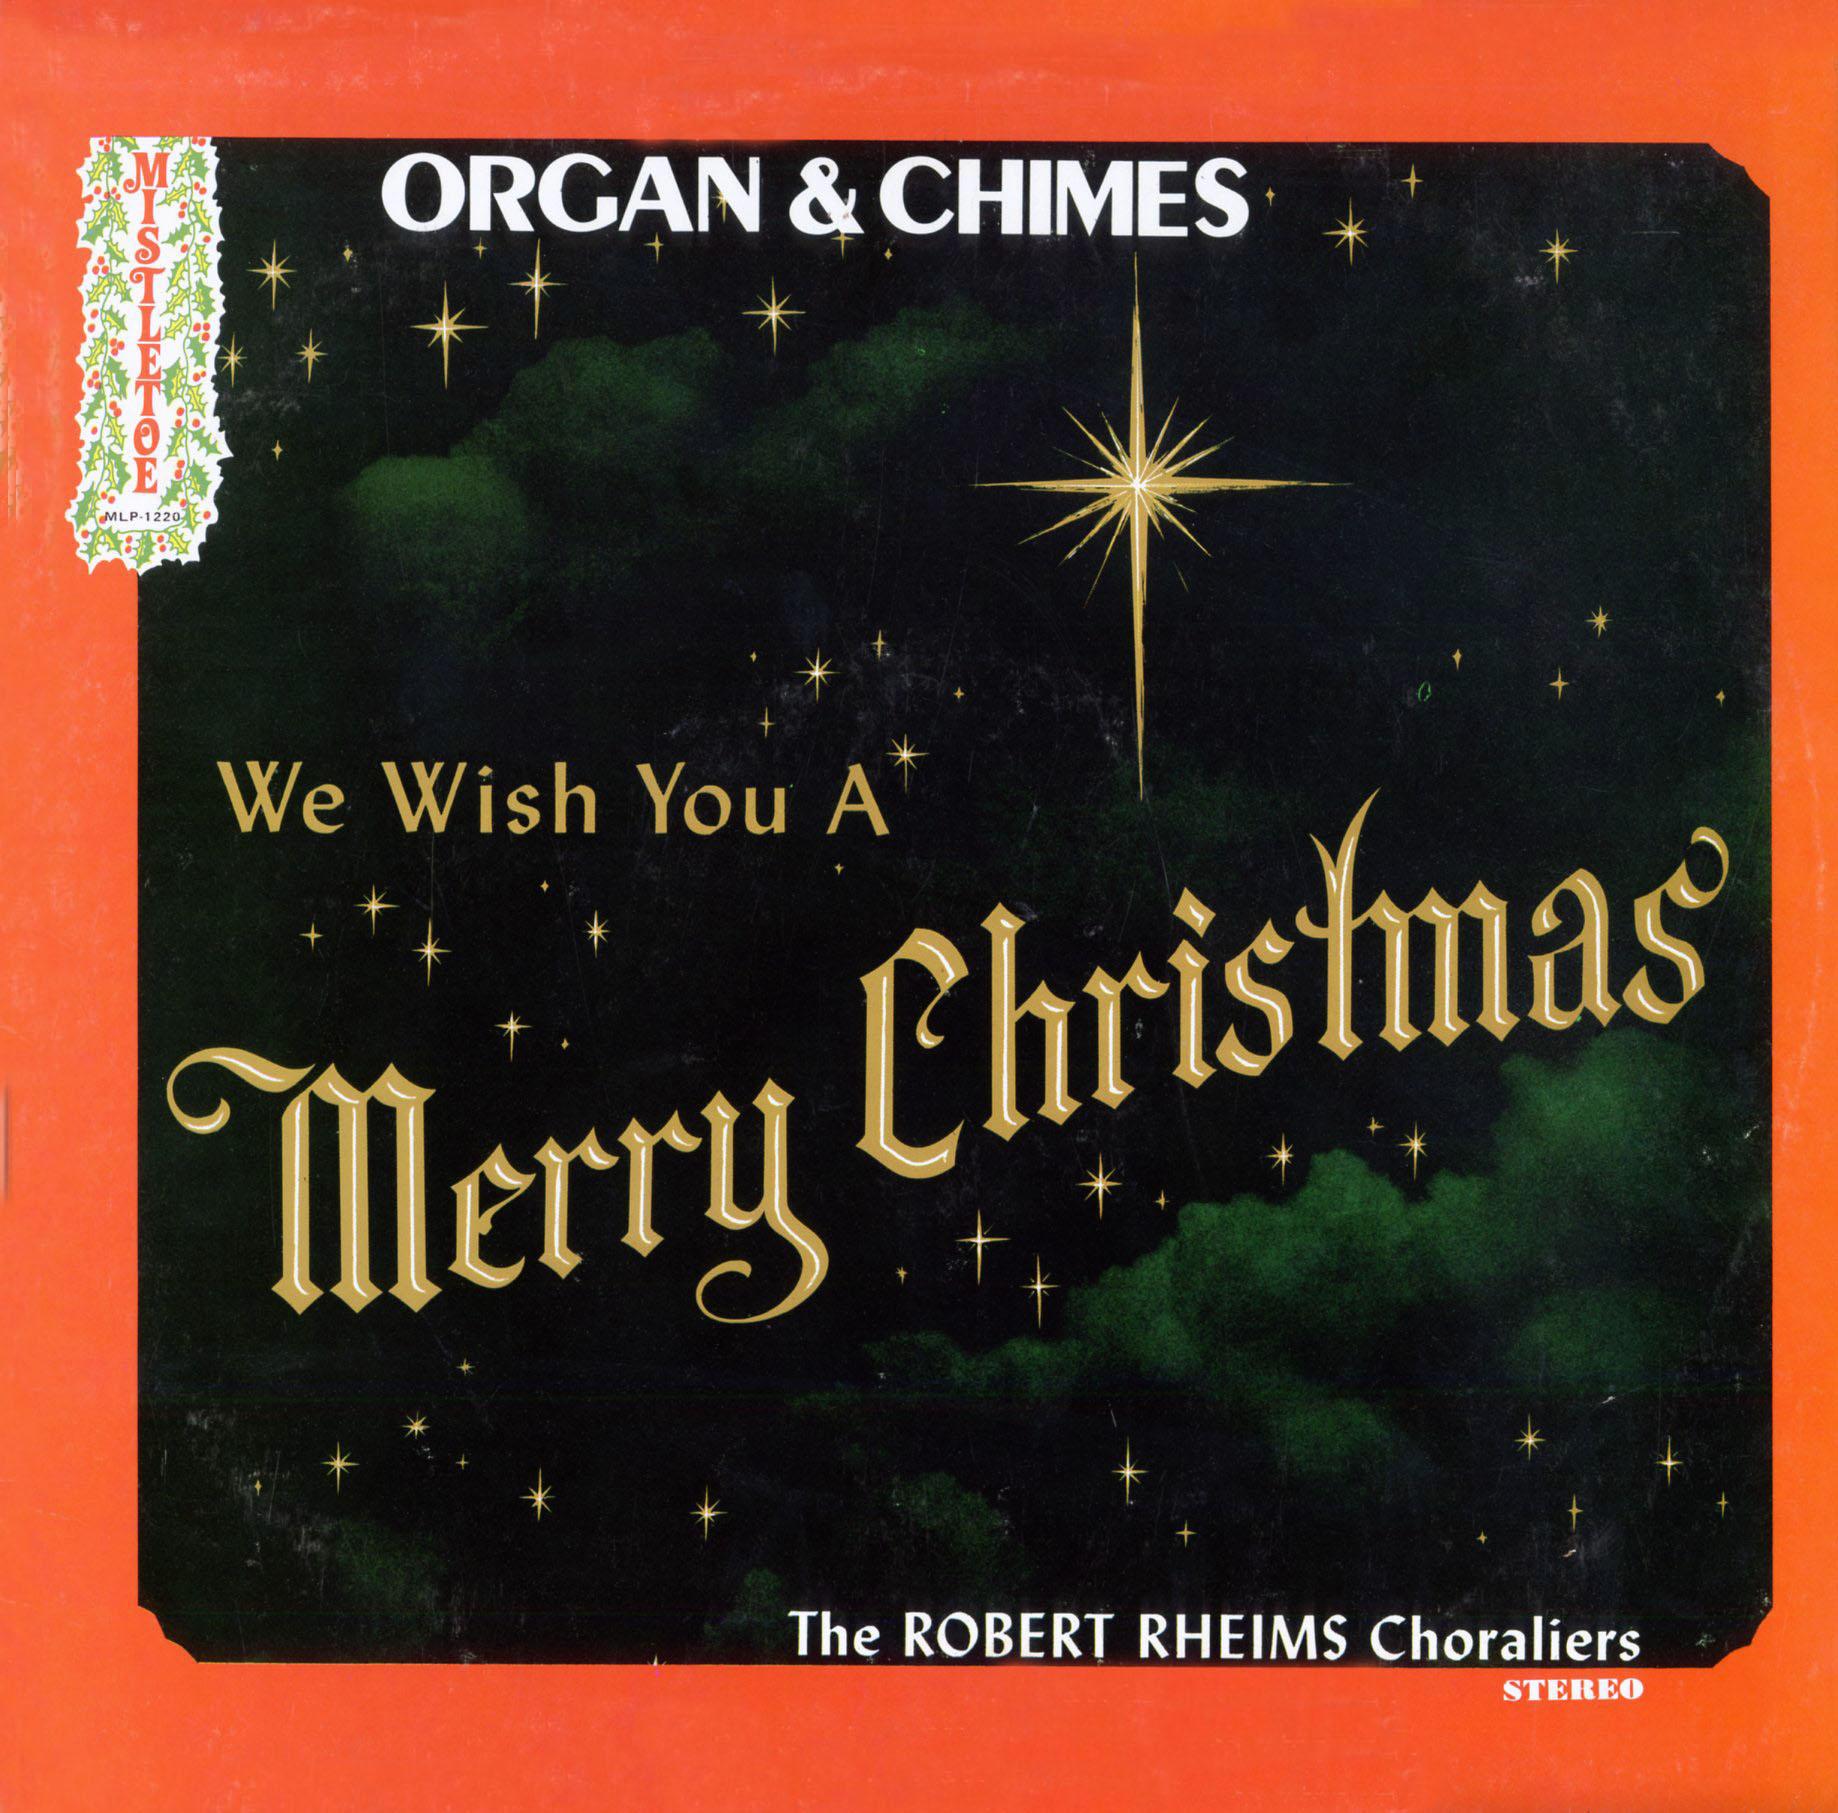 MP3 Download 320mb. Rheims, Robert. We Wish You a Merry Christmas (MLP1220) - Christmas LPs to ...